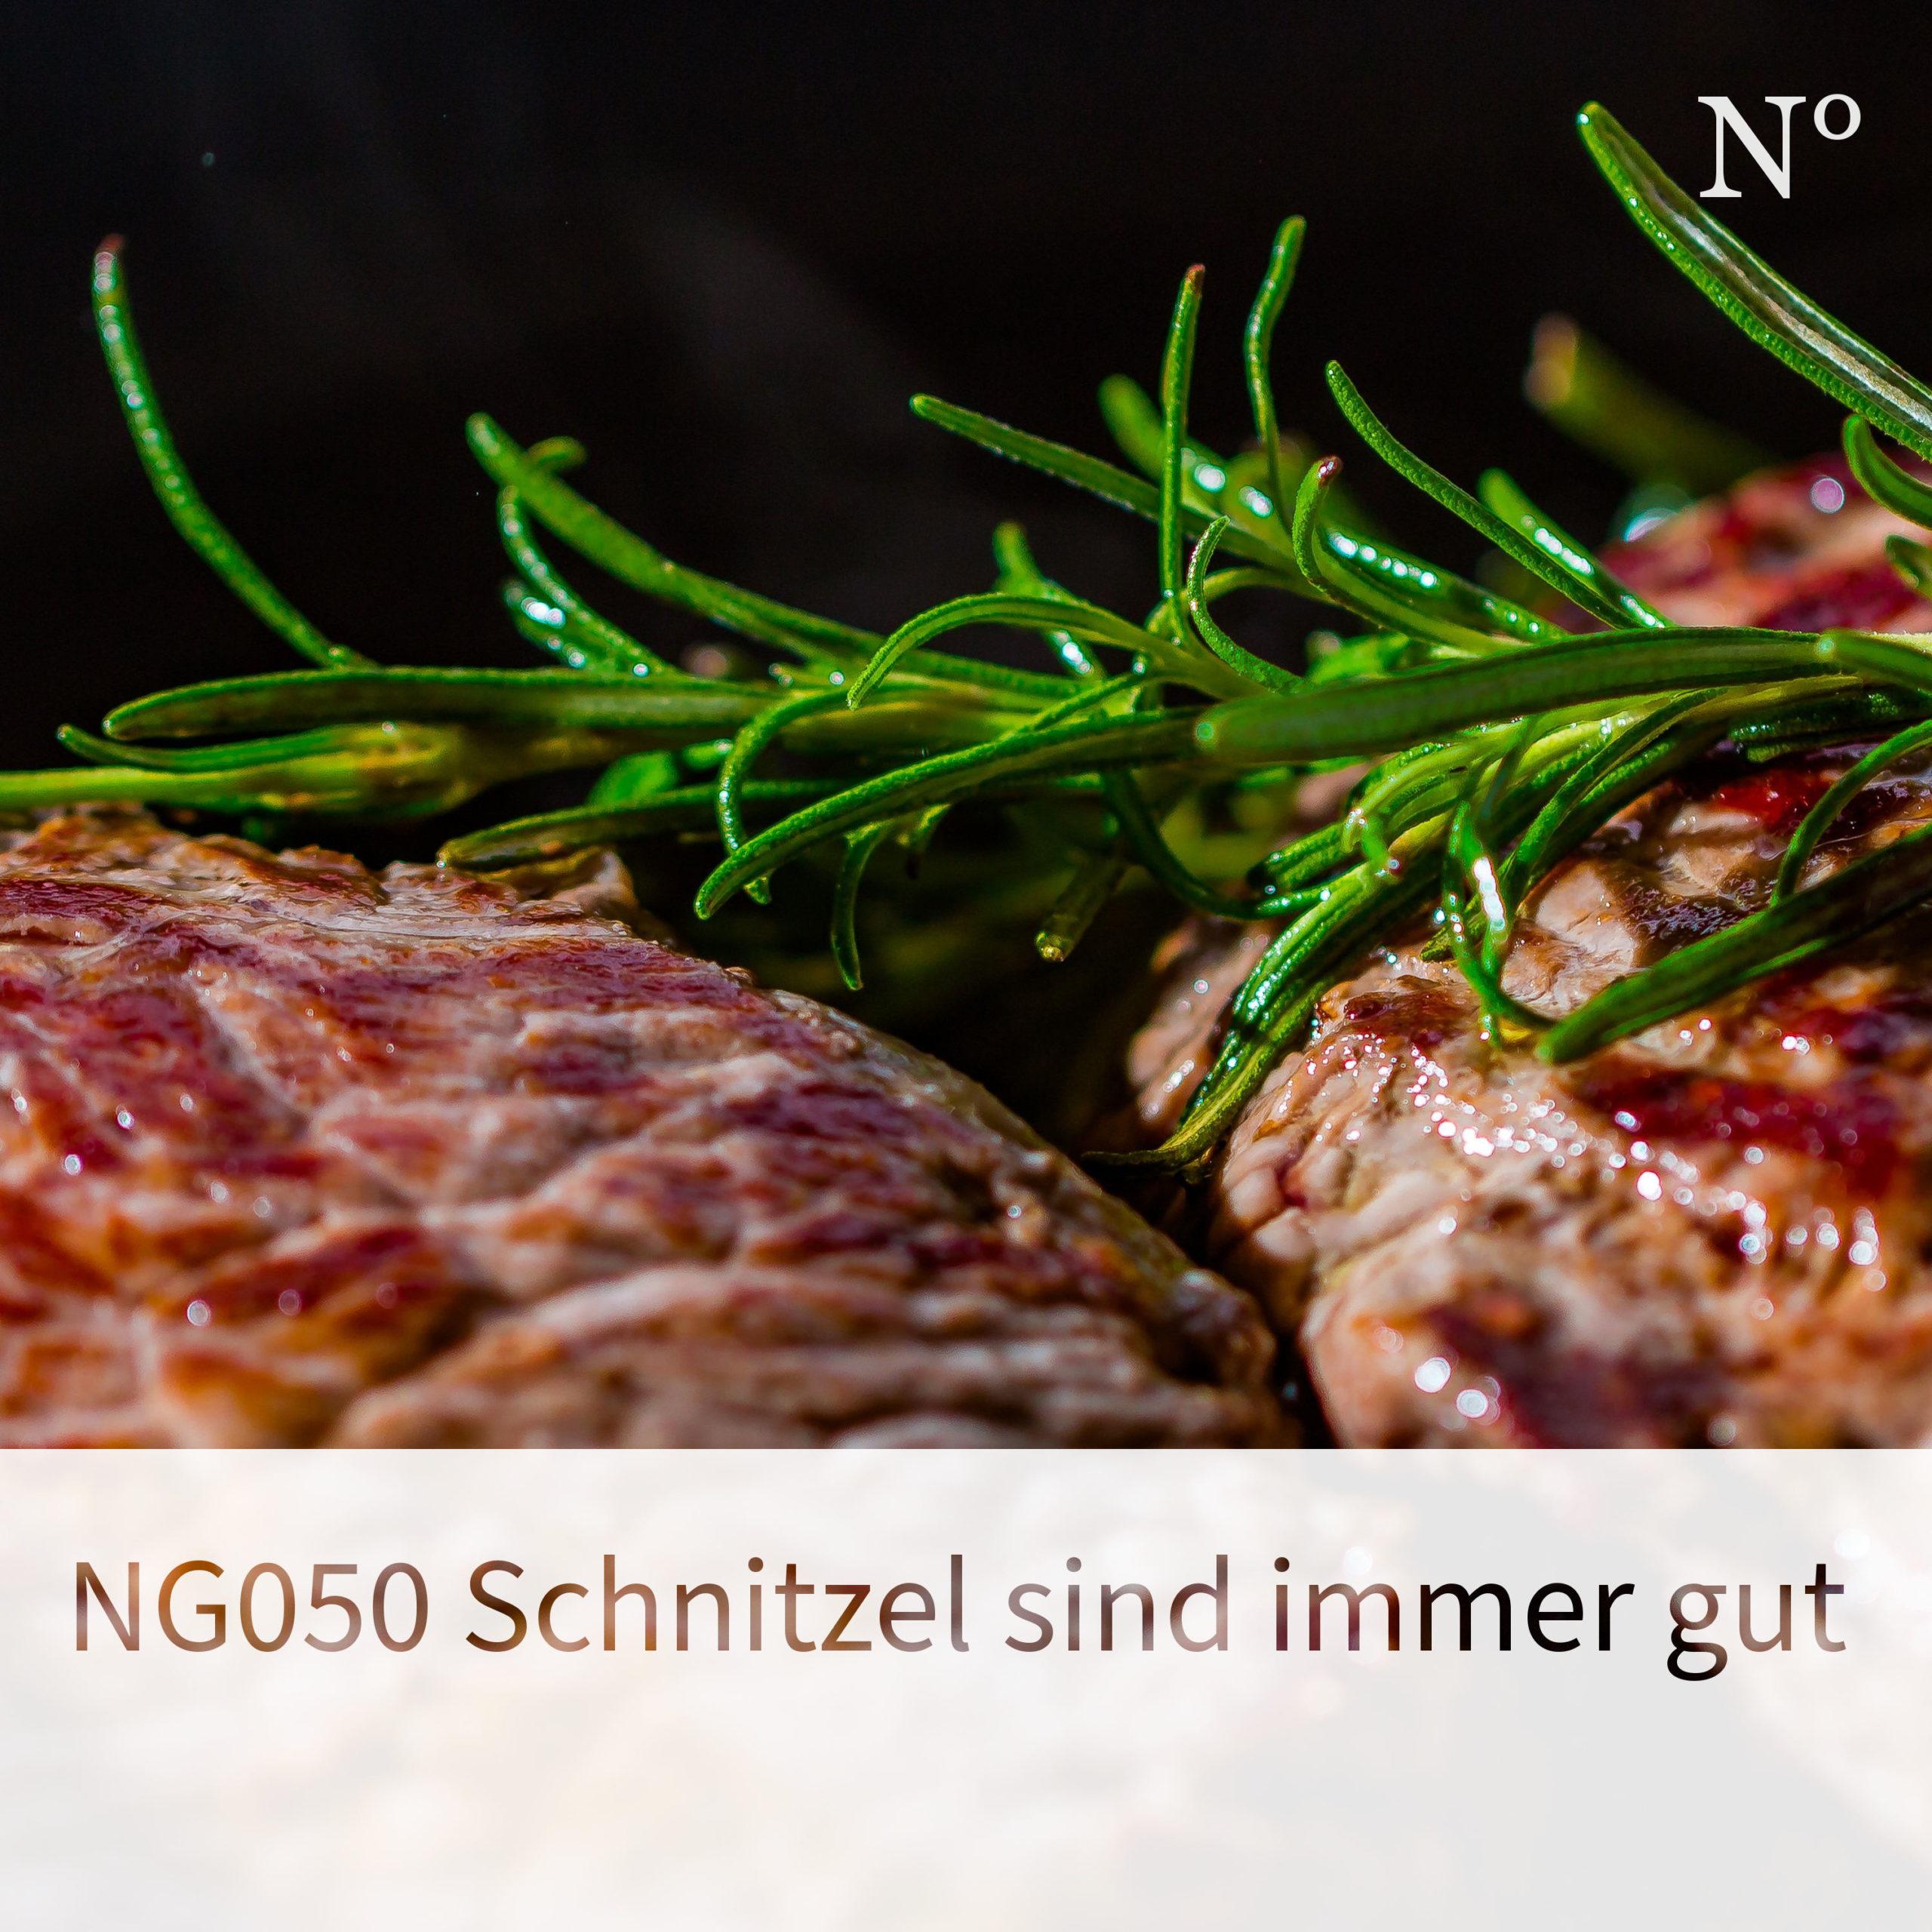 NG050 Schnitzel sind immer gut, Episoden-Cover